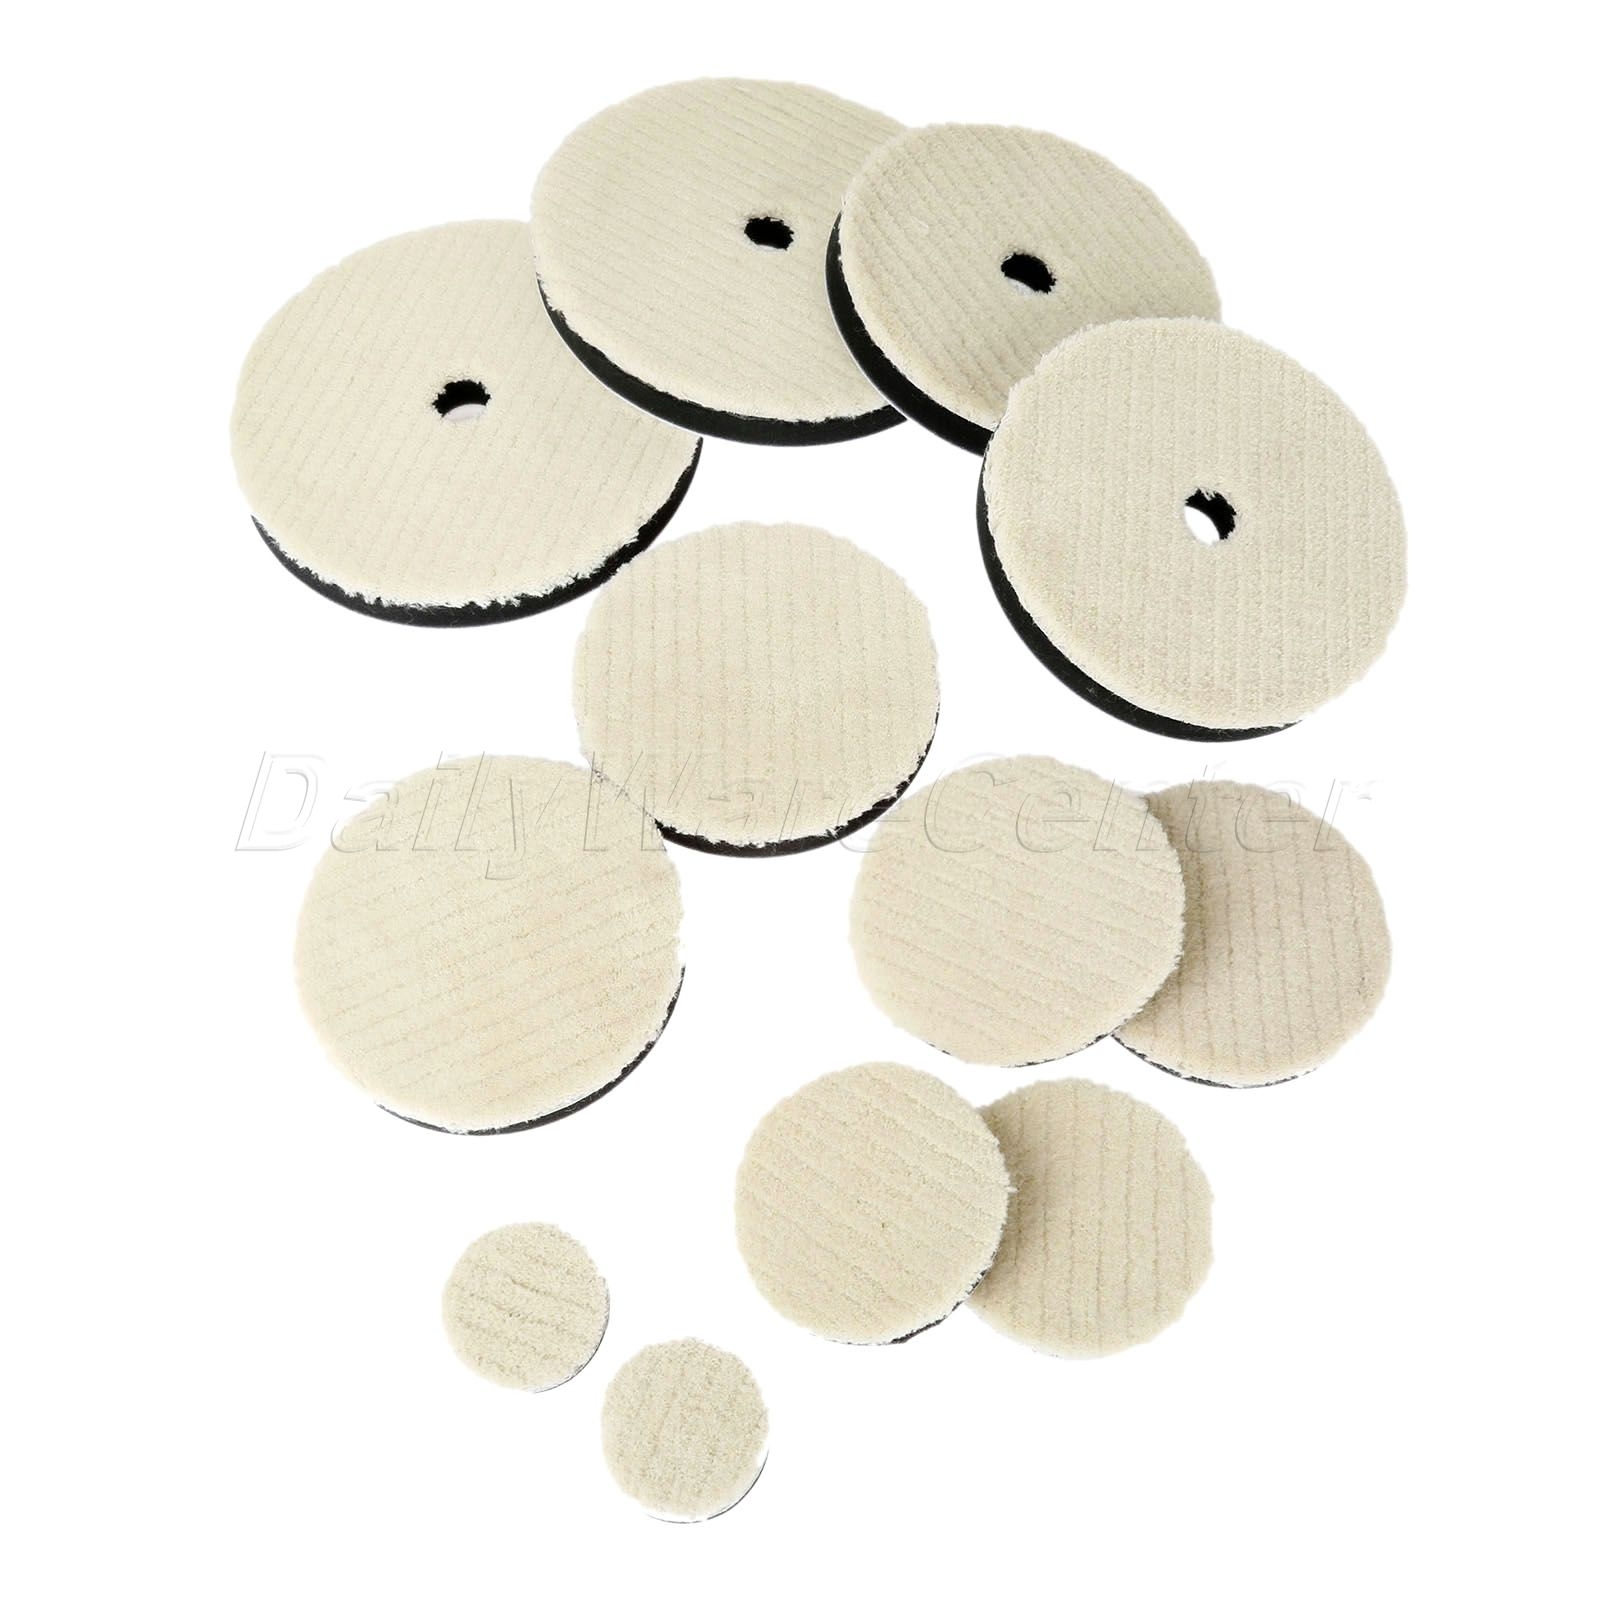 "2 x Car Care Woolen Polishing Pad 2/""//3/""//4/""//5/""//5/""//7/"" Cleaning Waxing Buffing Kit"